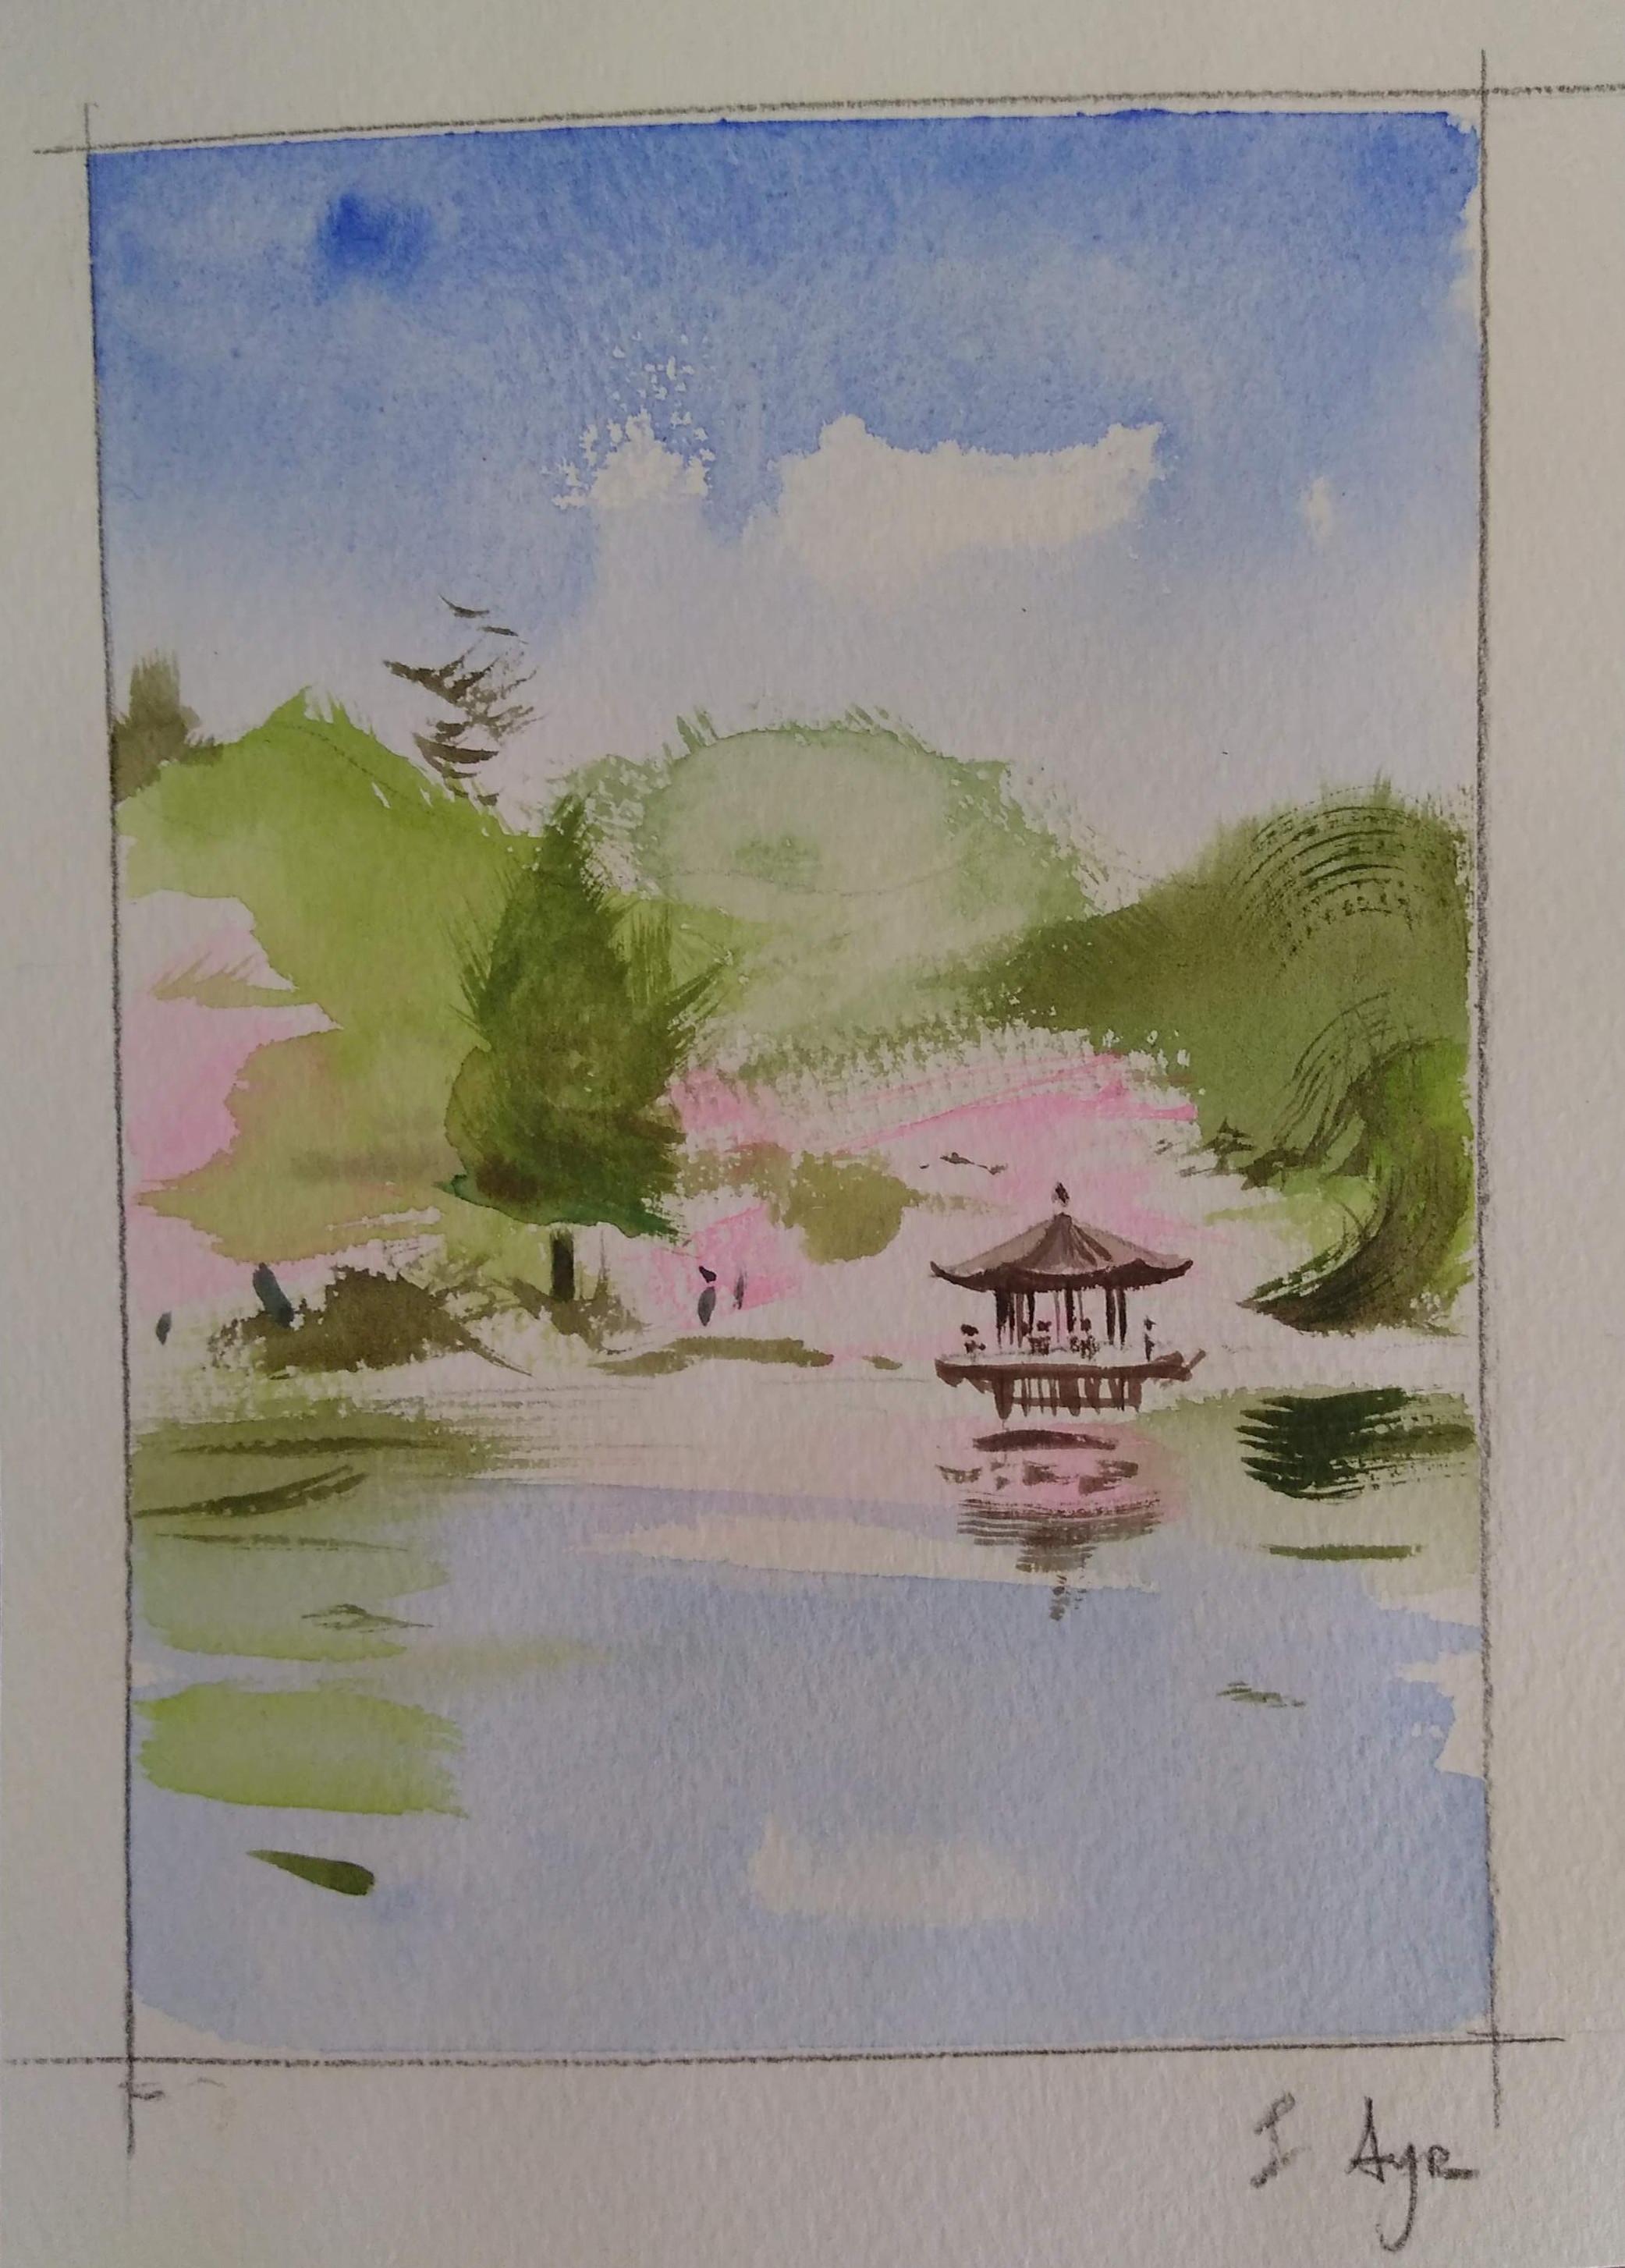 48_Stuart_Ayre__Ukumi-do_Pavillion_in_Nara.jpg